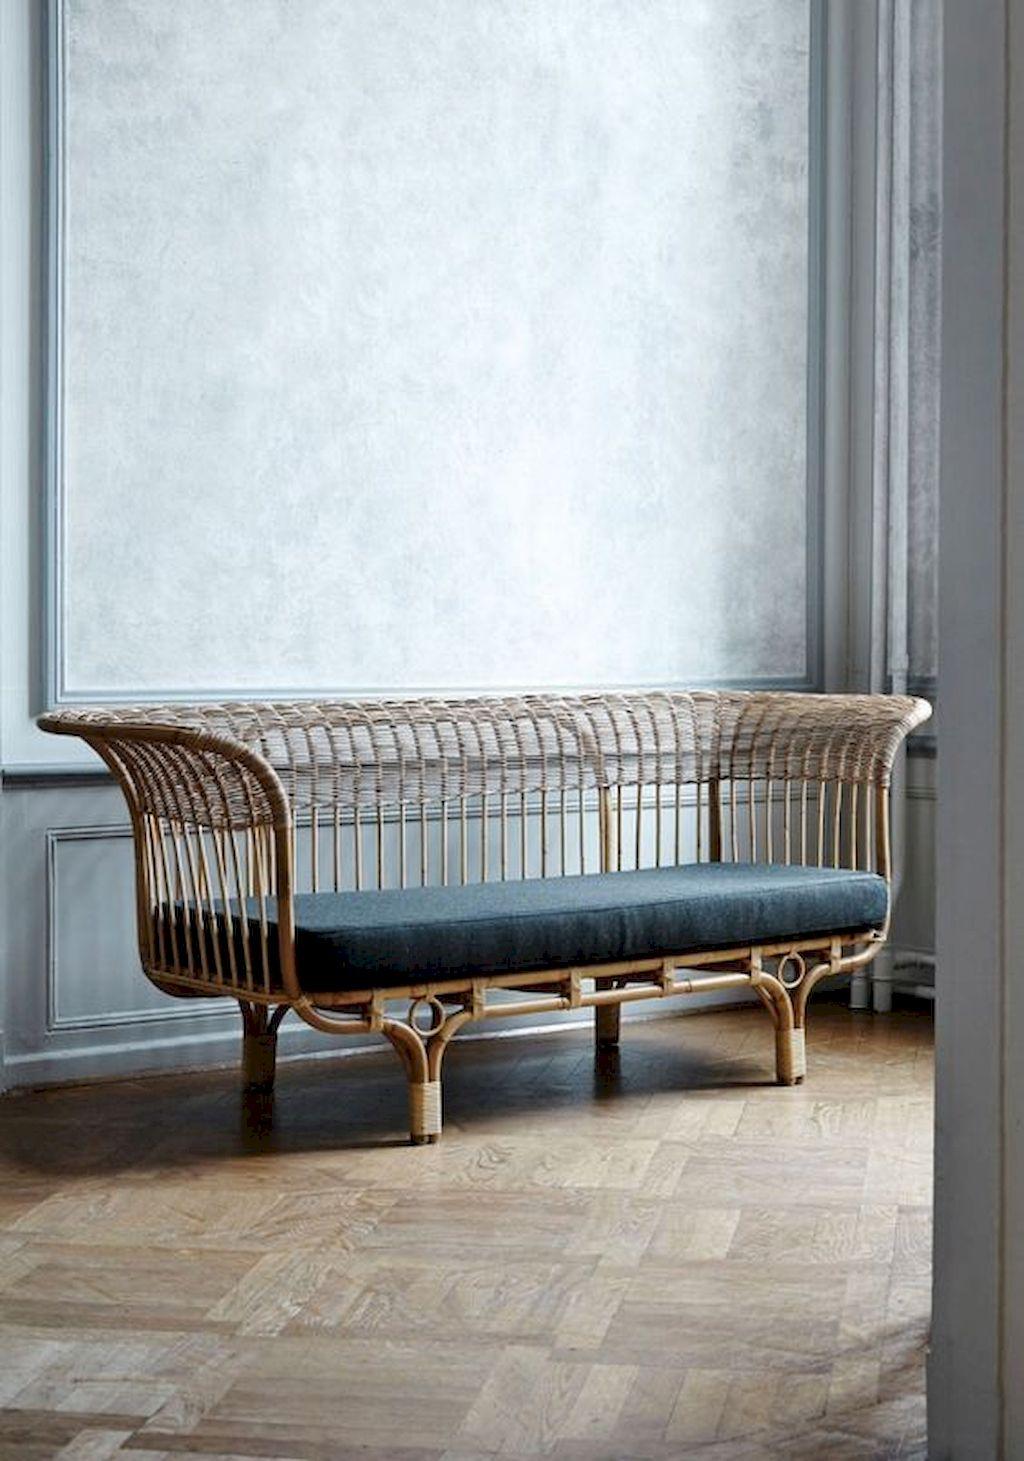 Rattan Furniture063